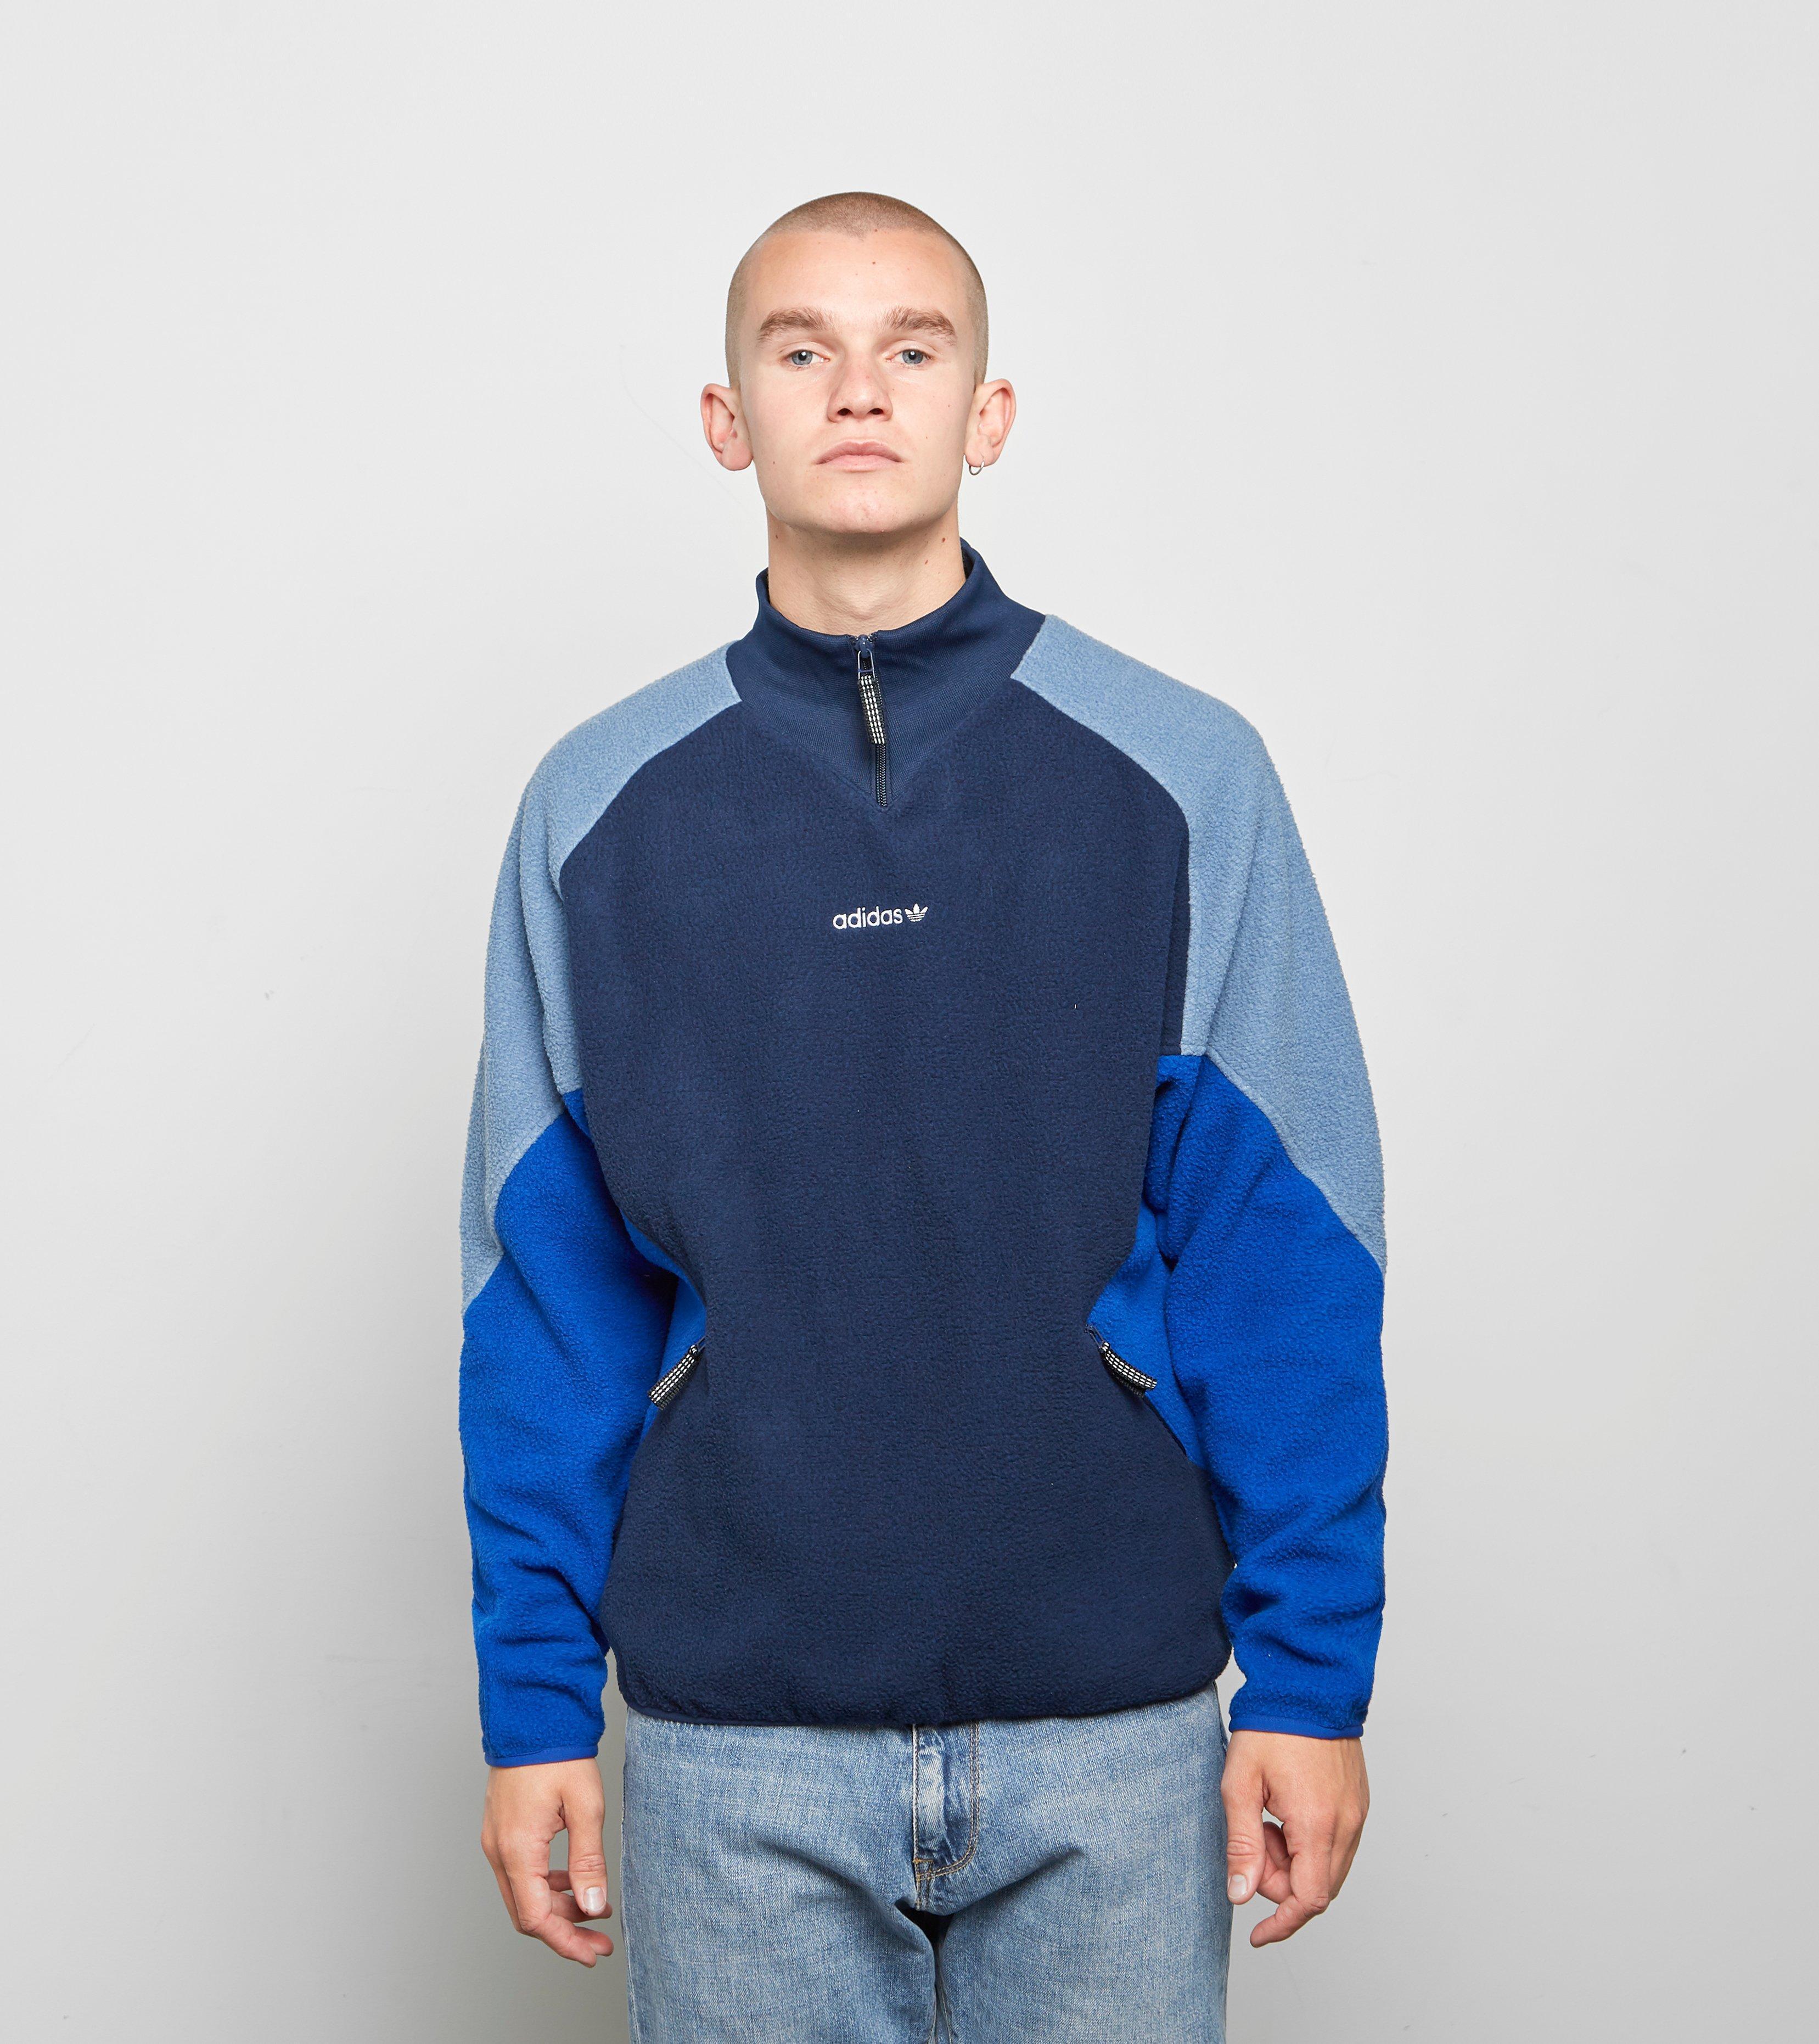 adidas Originals Eqt Polar Fleece Jacket in Blue for Men Lyst